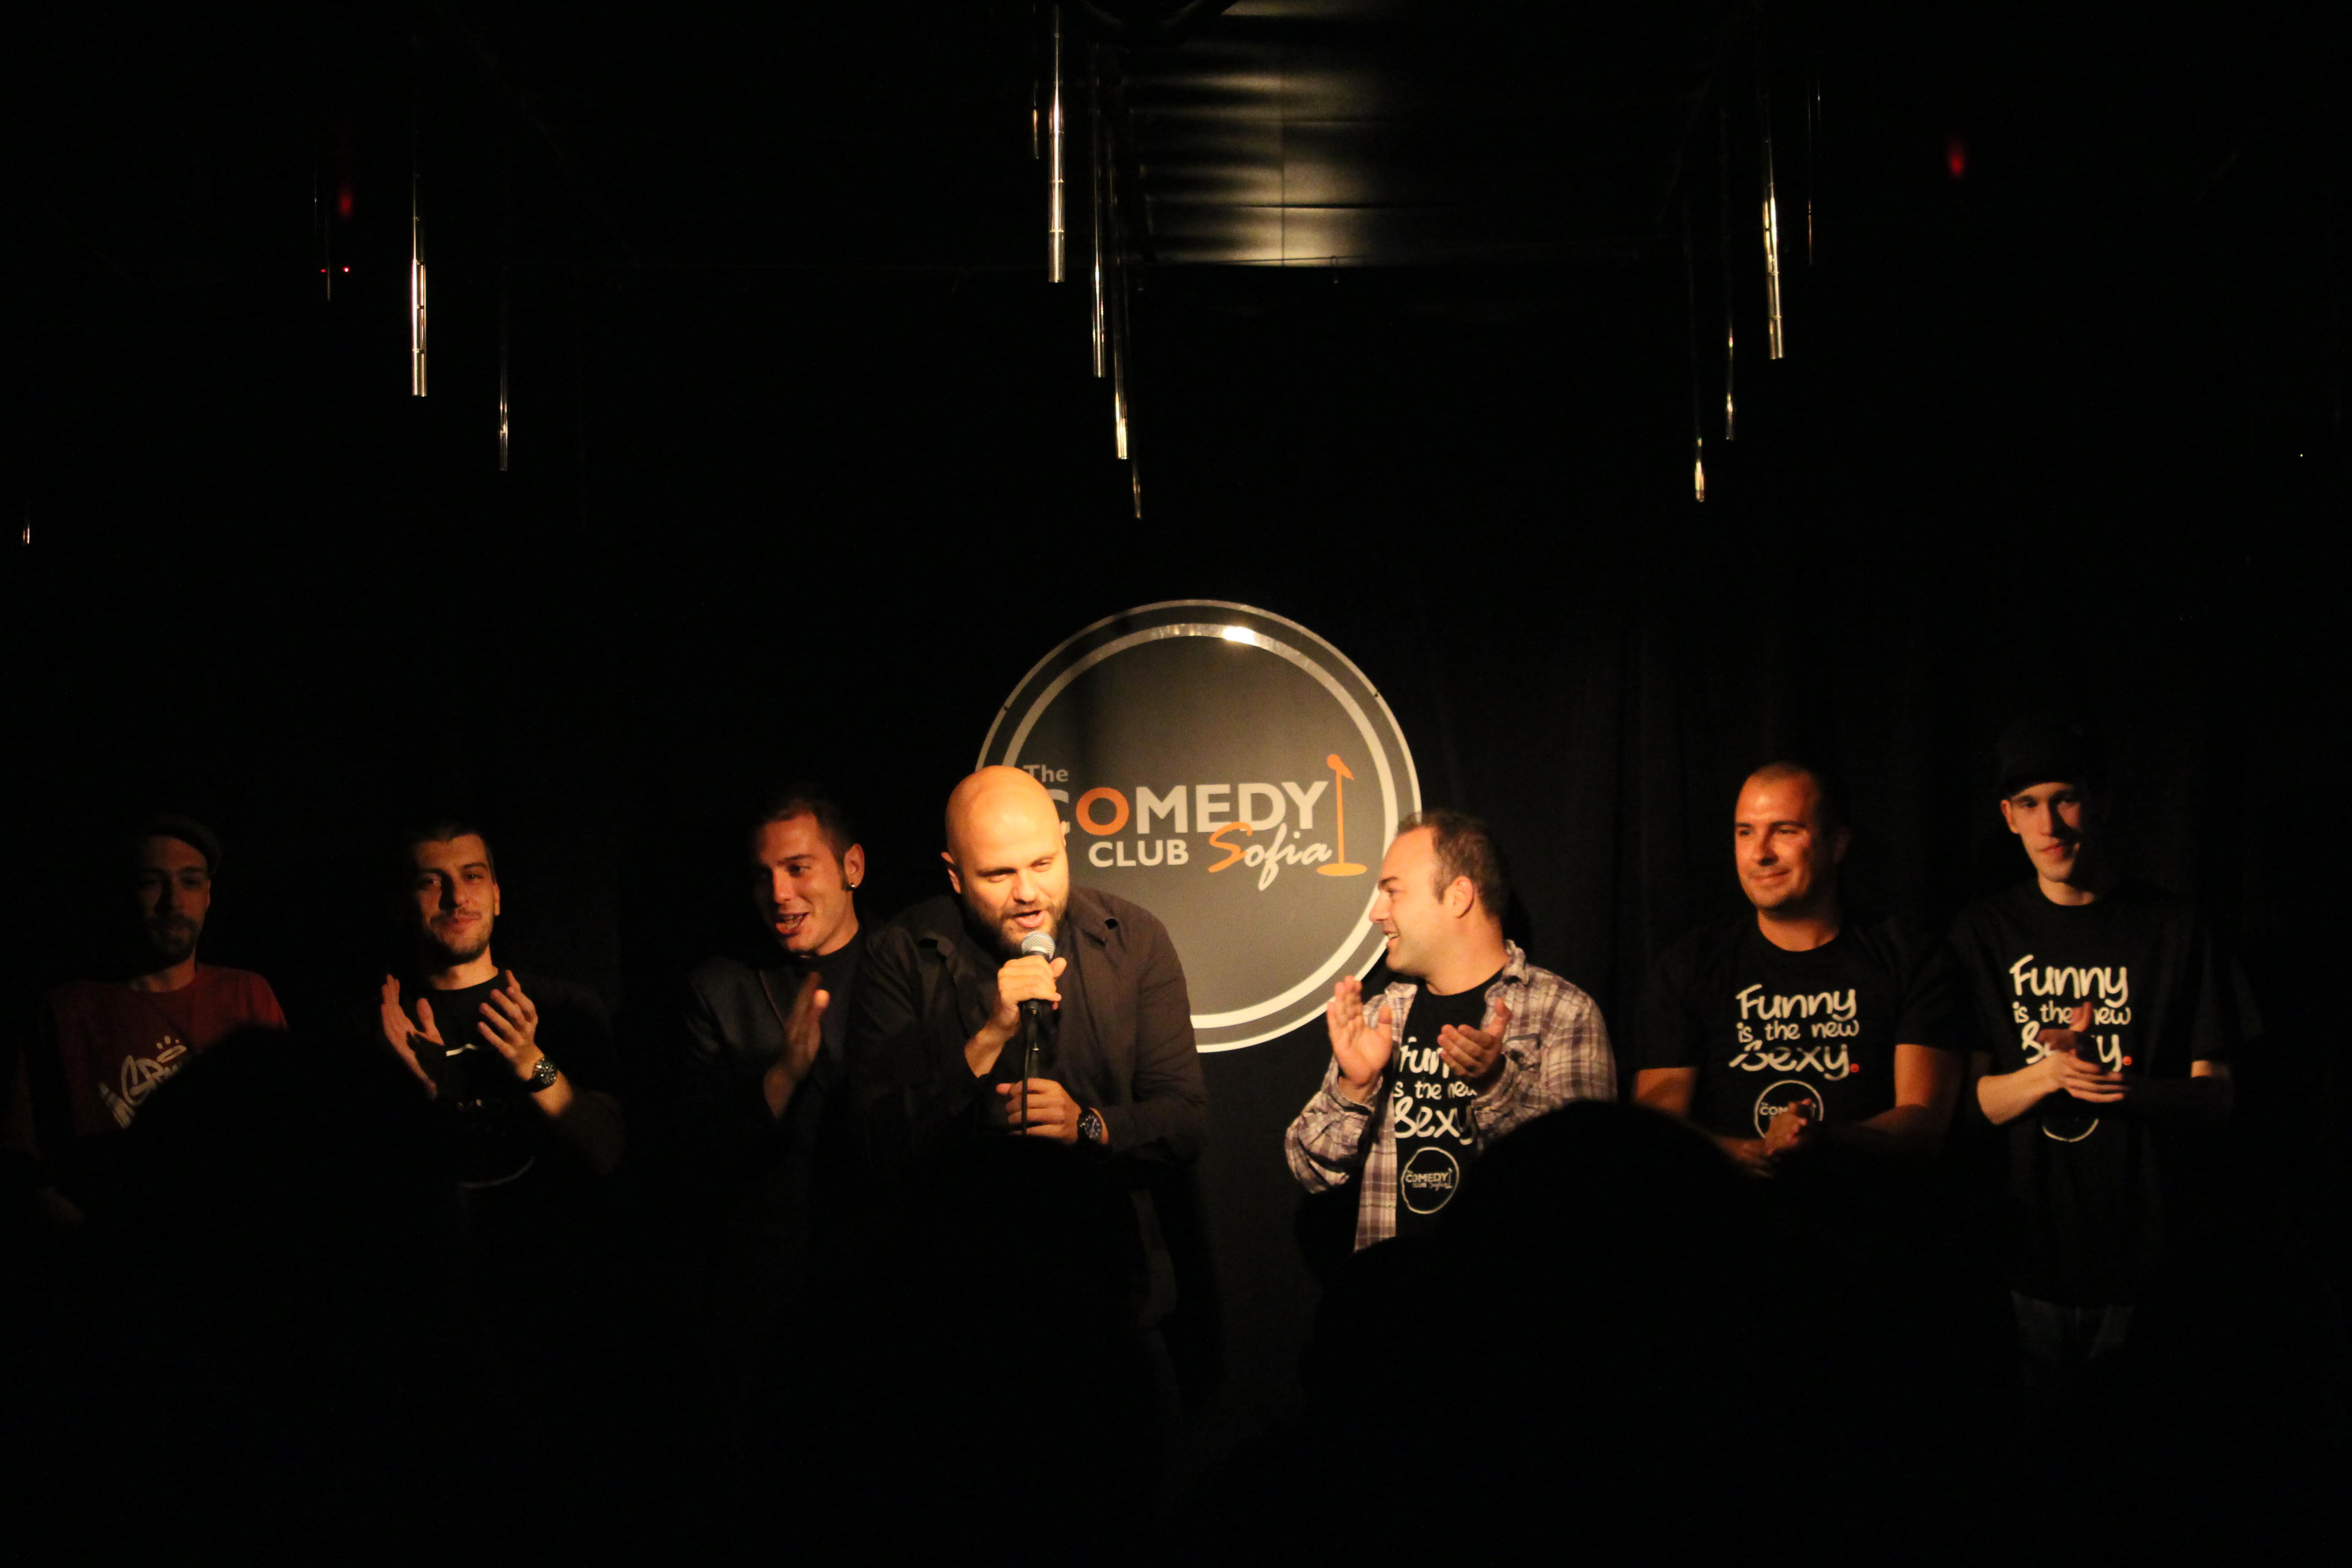 Open Mic Comedy Club Sofia Bulgaria